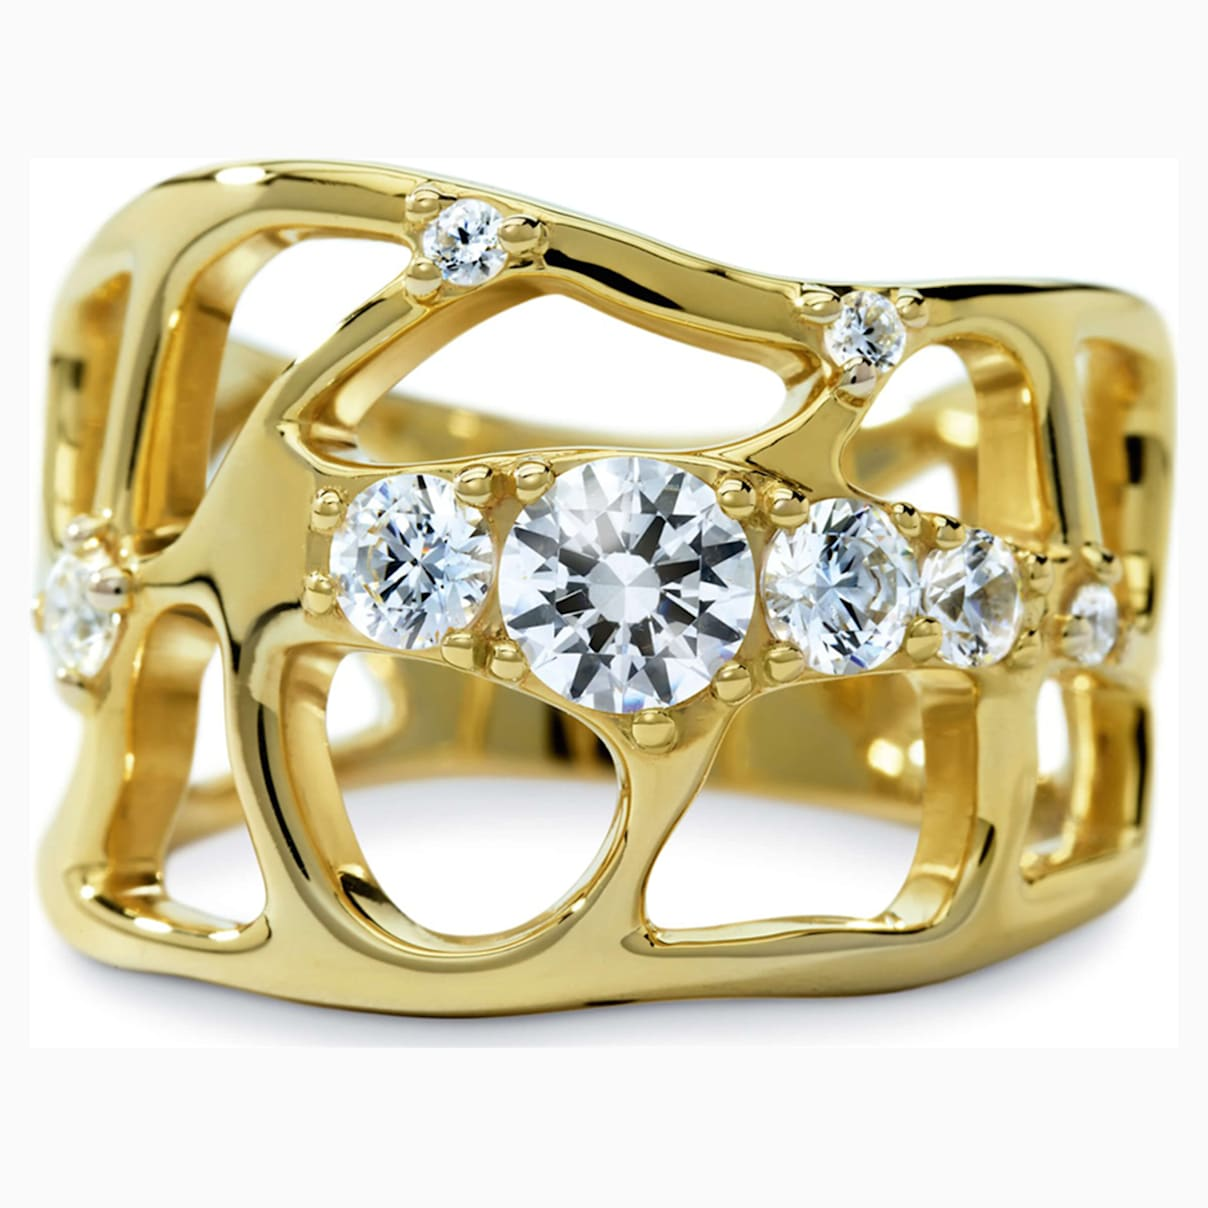 Lace Ring, Swarovski Created Diamonds, 18K Yellow Gold, Size 55